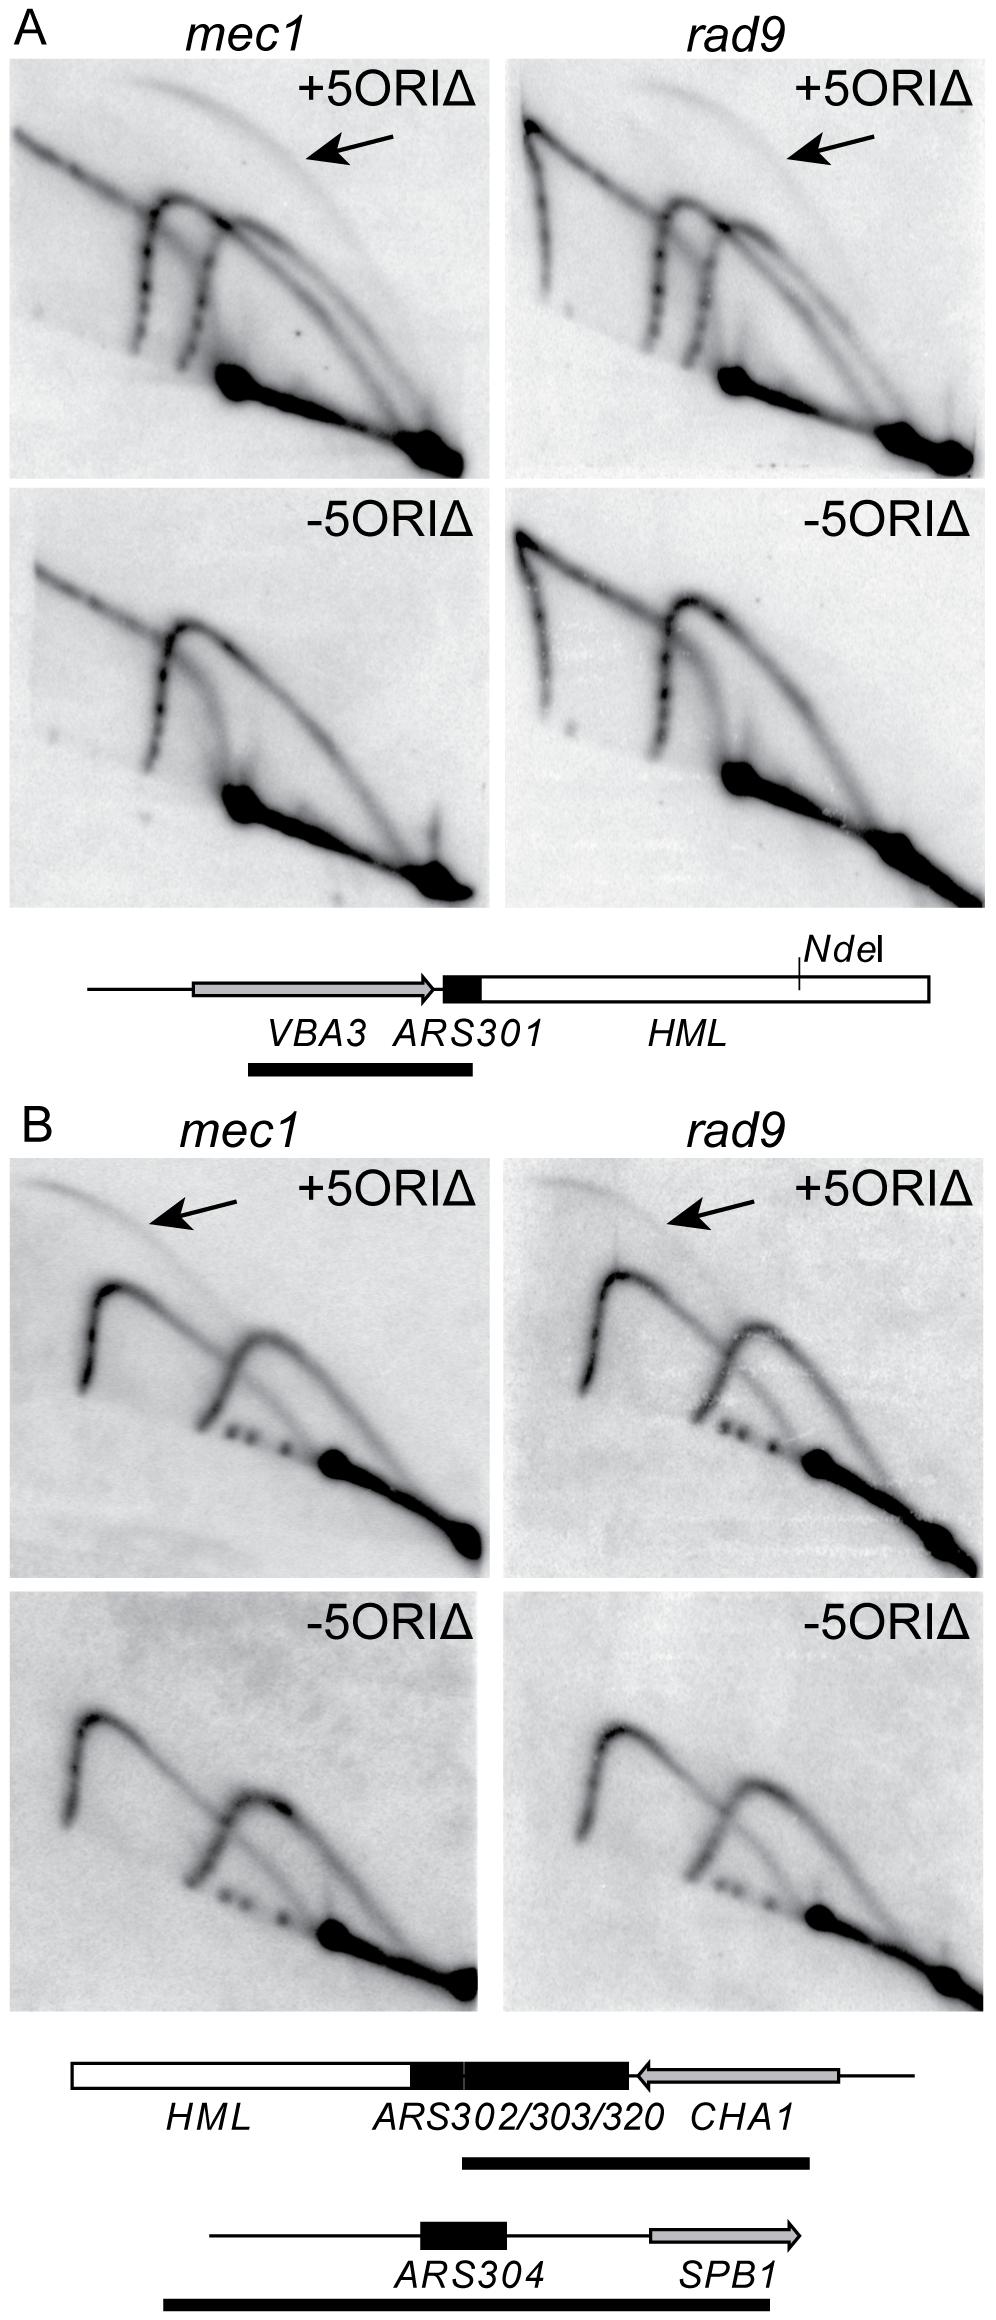 Activity of dormant origins on full-length 5ORIΔ chromosome in <i>mec1</i> and <i>rad9</i> mutants.